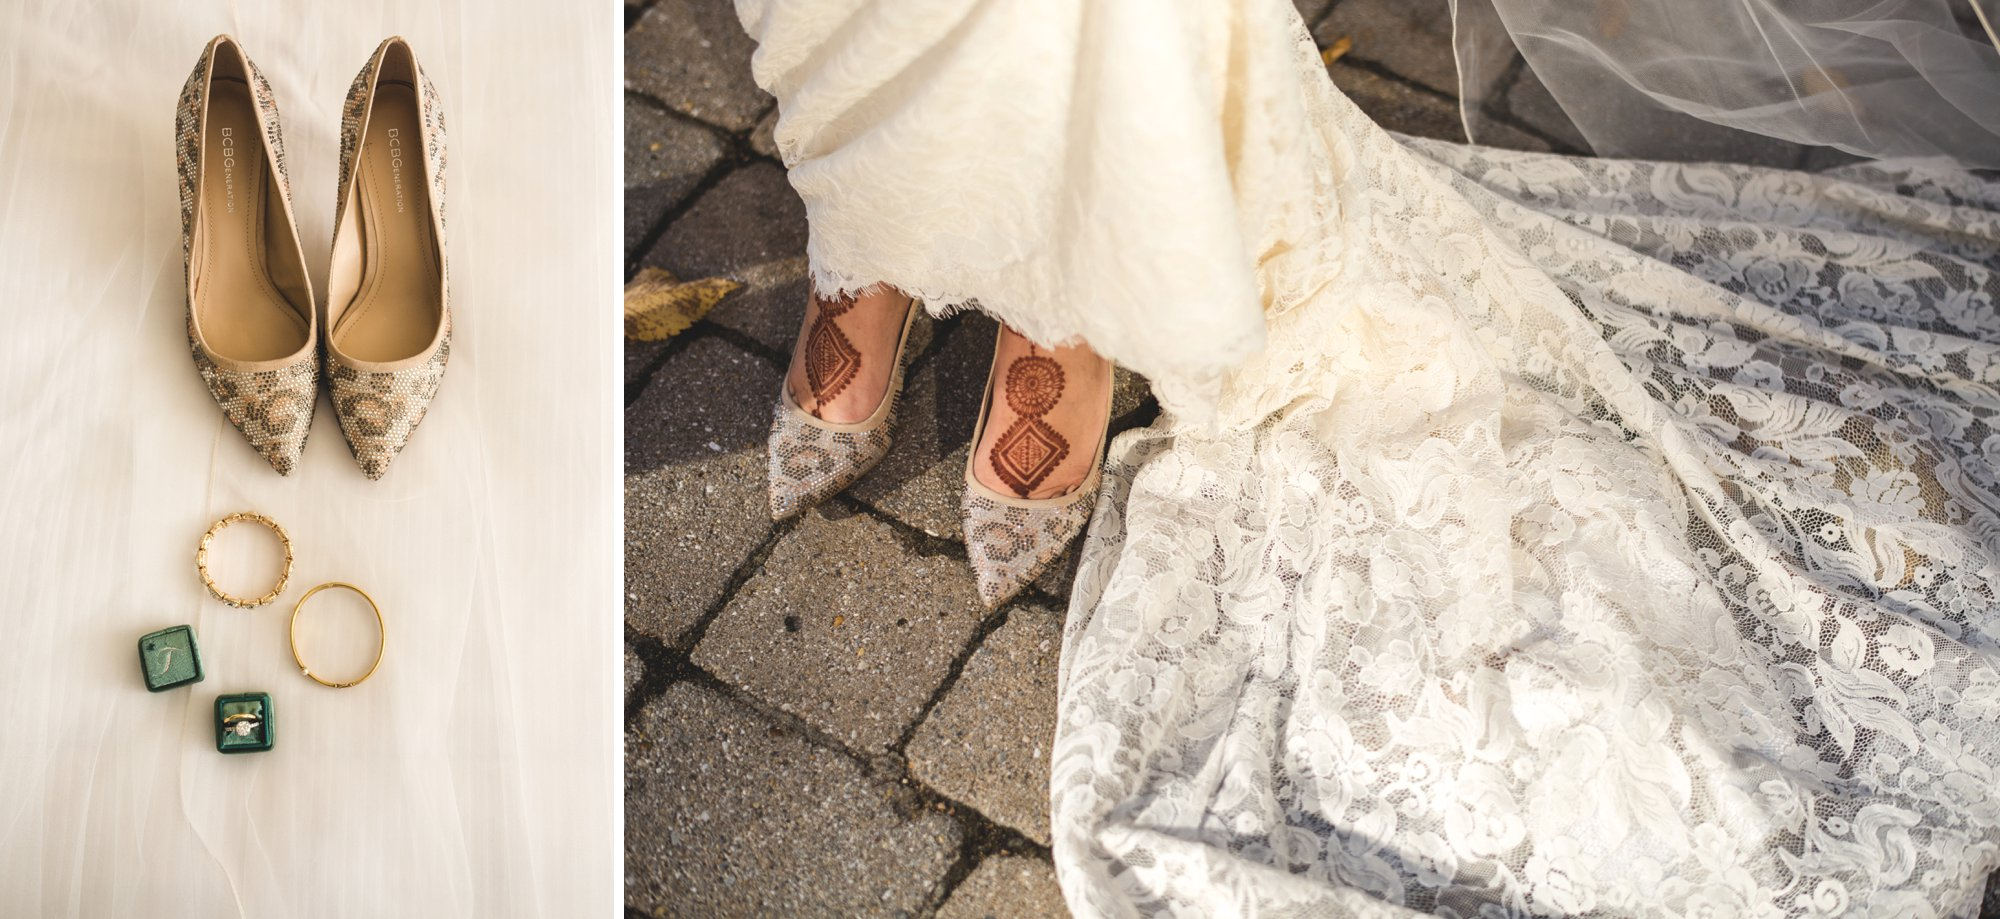 Washington DC colorful Indian wedding with a feminist bride. Bridal details